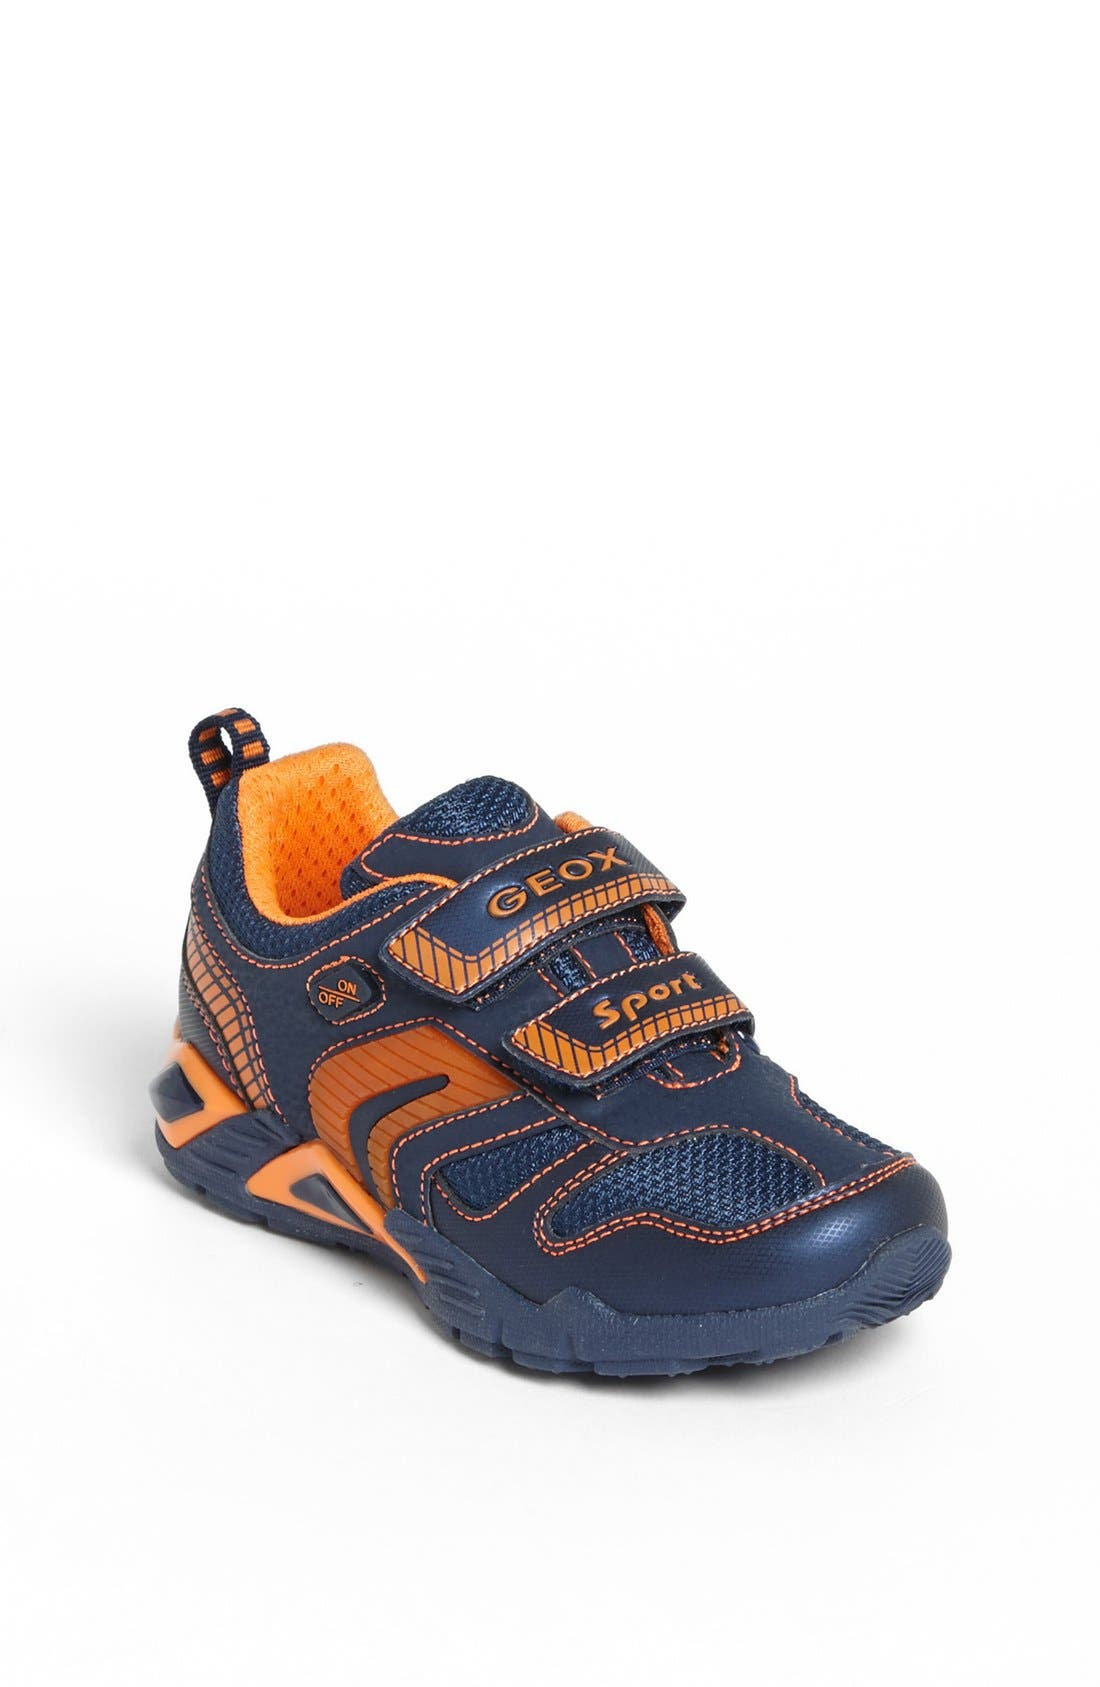 Alternate Image 1 Selected - Geox 'Supreme' Light-Up Sneaker (Toddler, Little Kid & Big Kid)